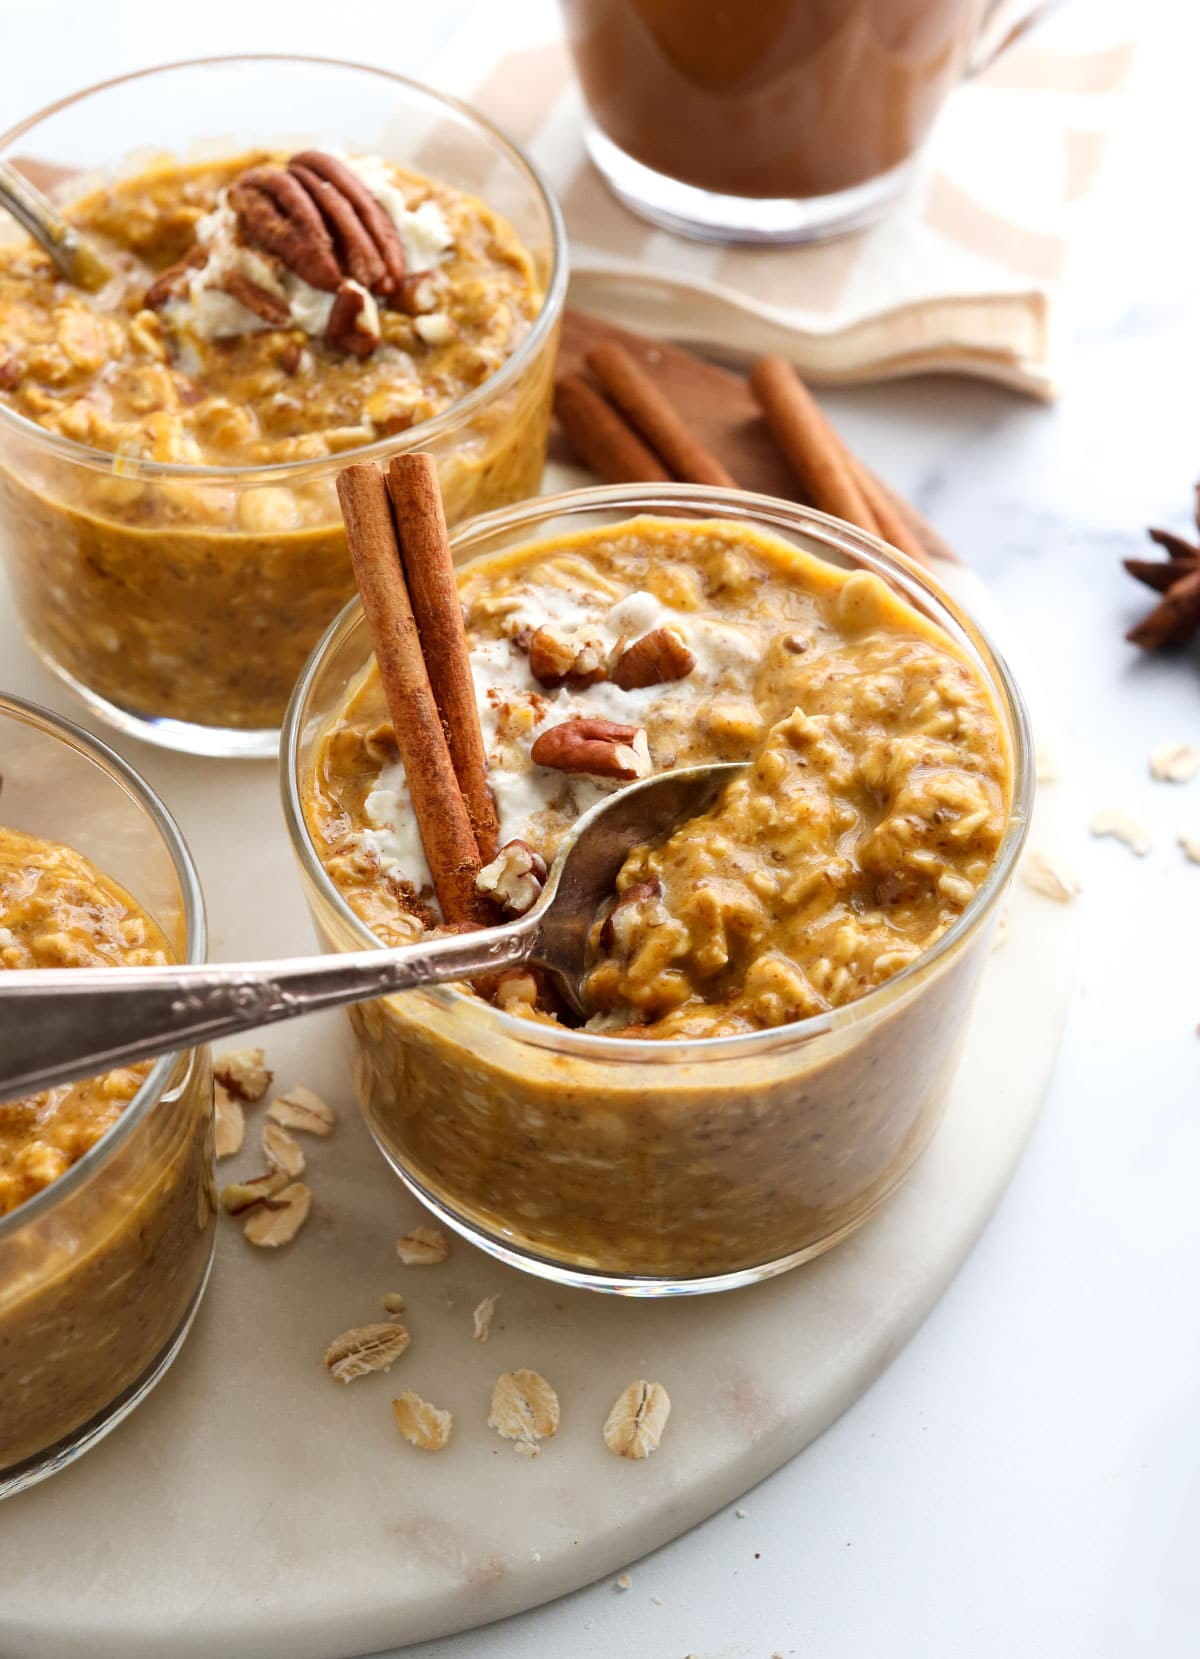 pumpkin overnight oats with spoon inside